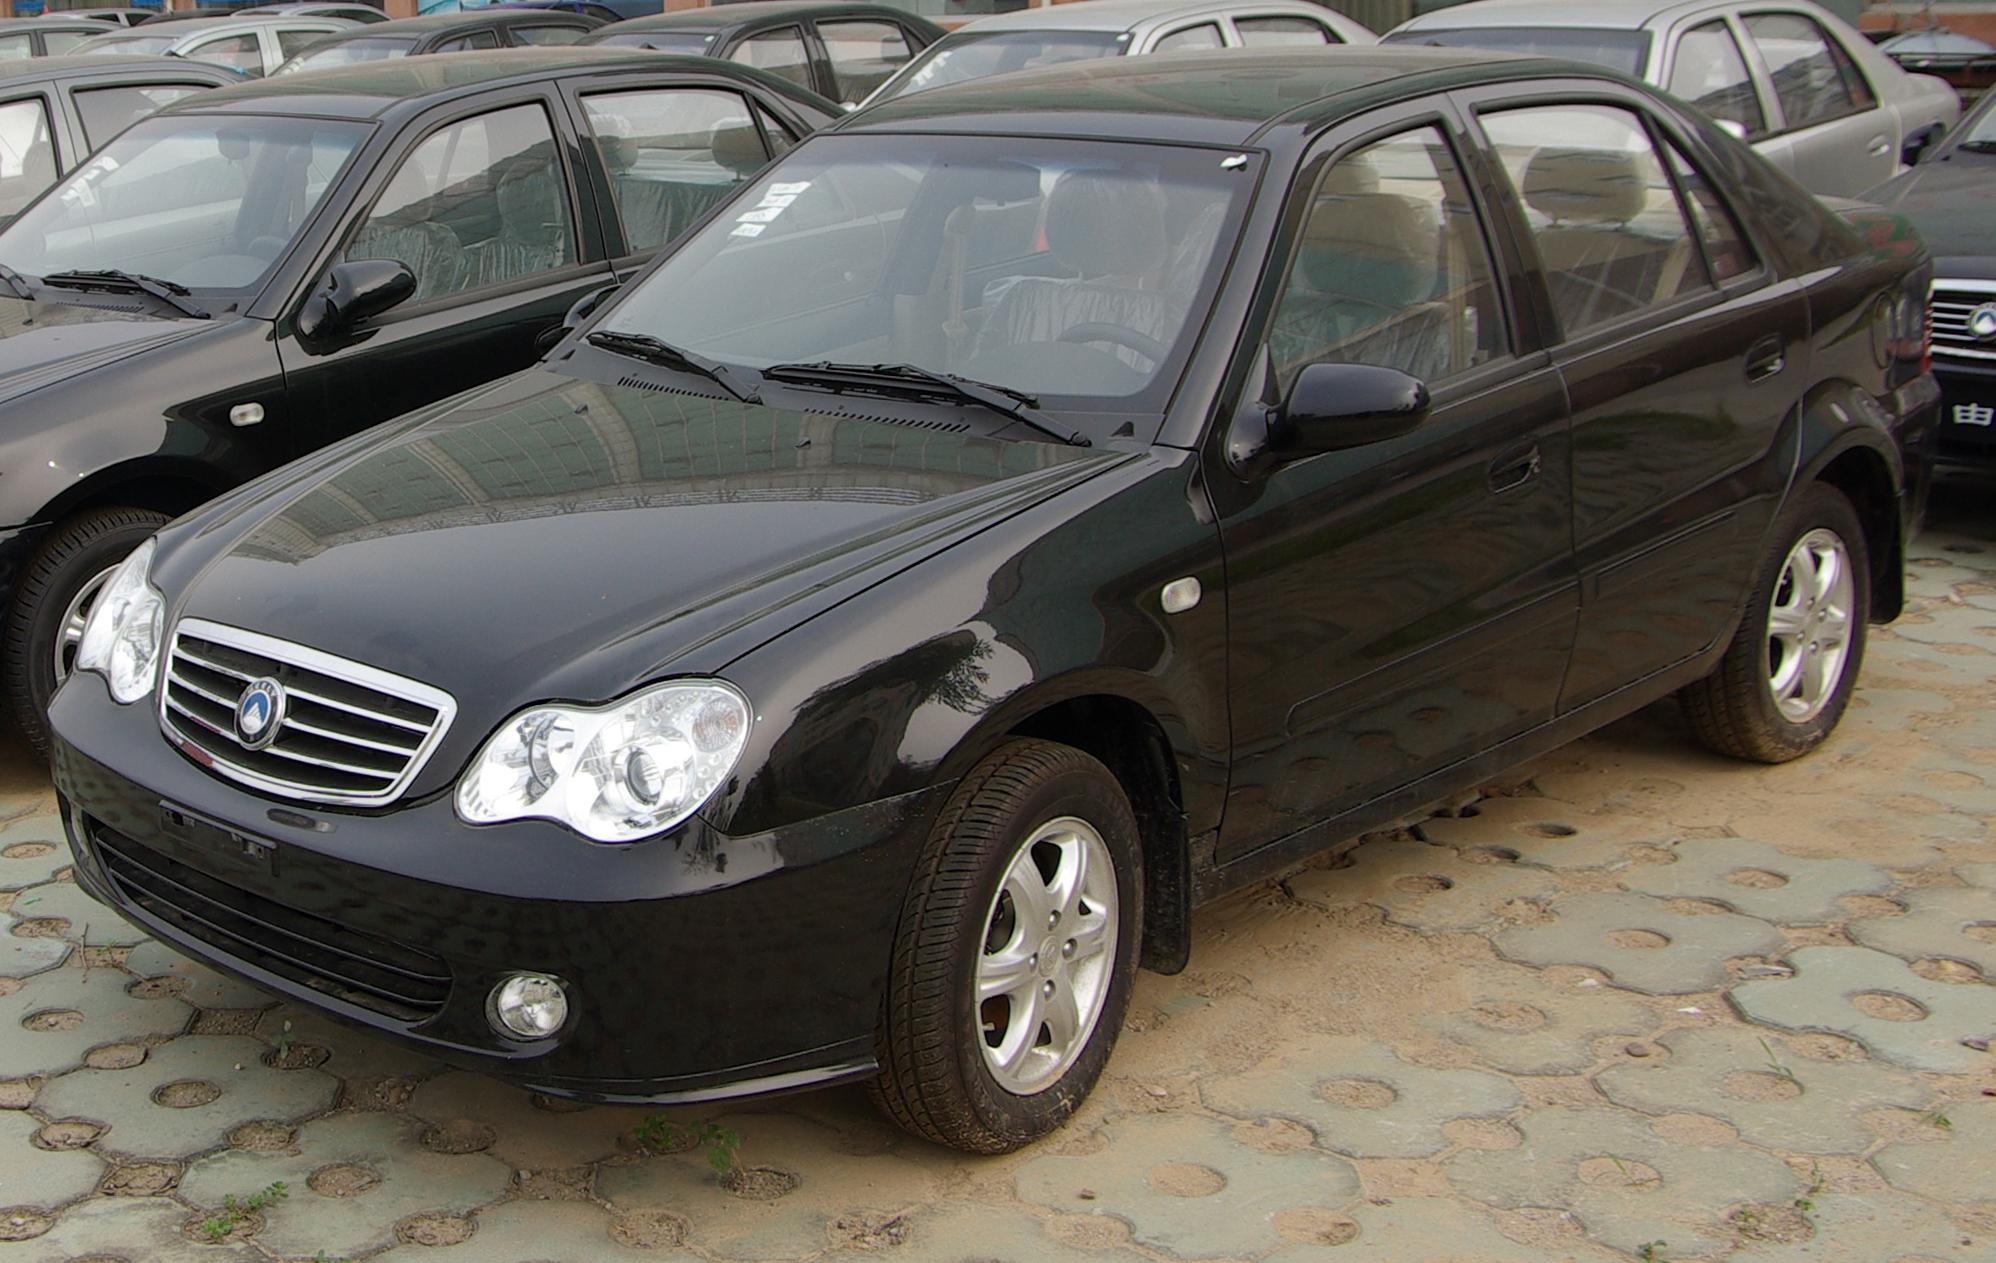 Geely CK (Otaka) I Restyling 2008 - 2016 Sedan #3